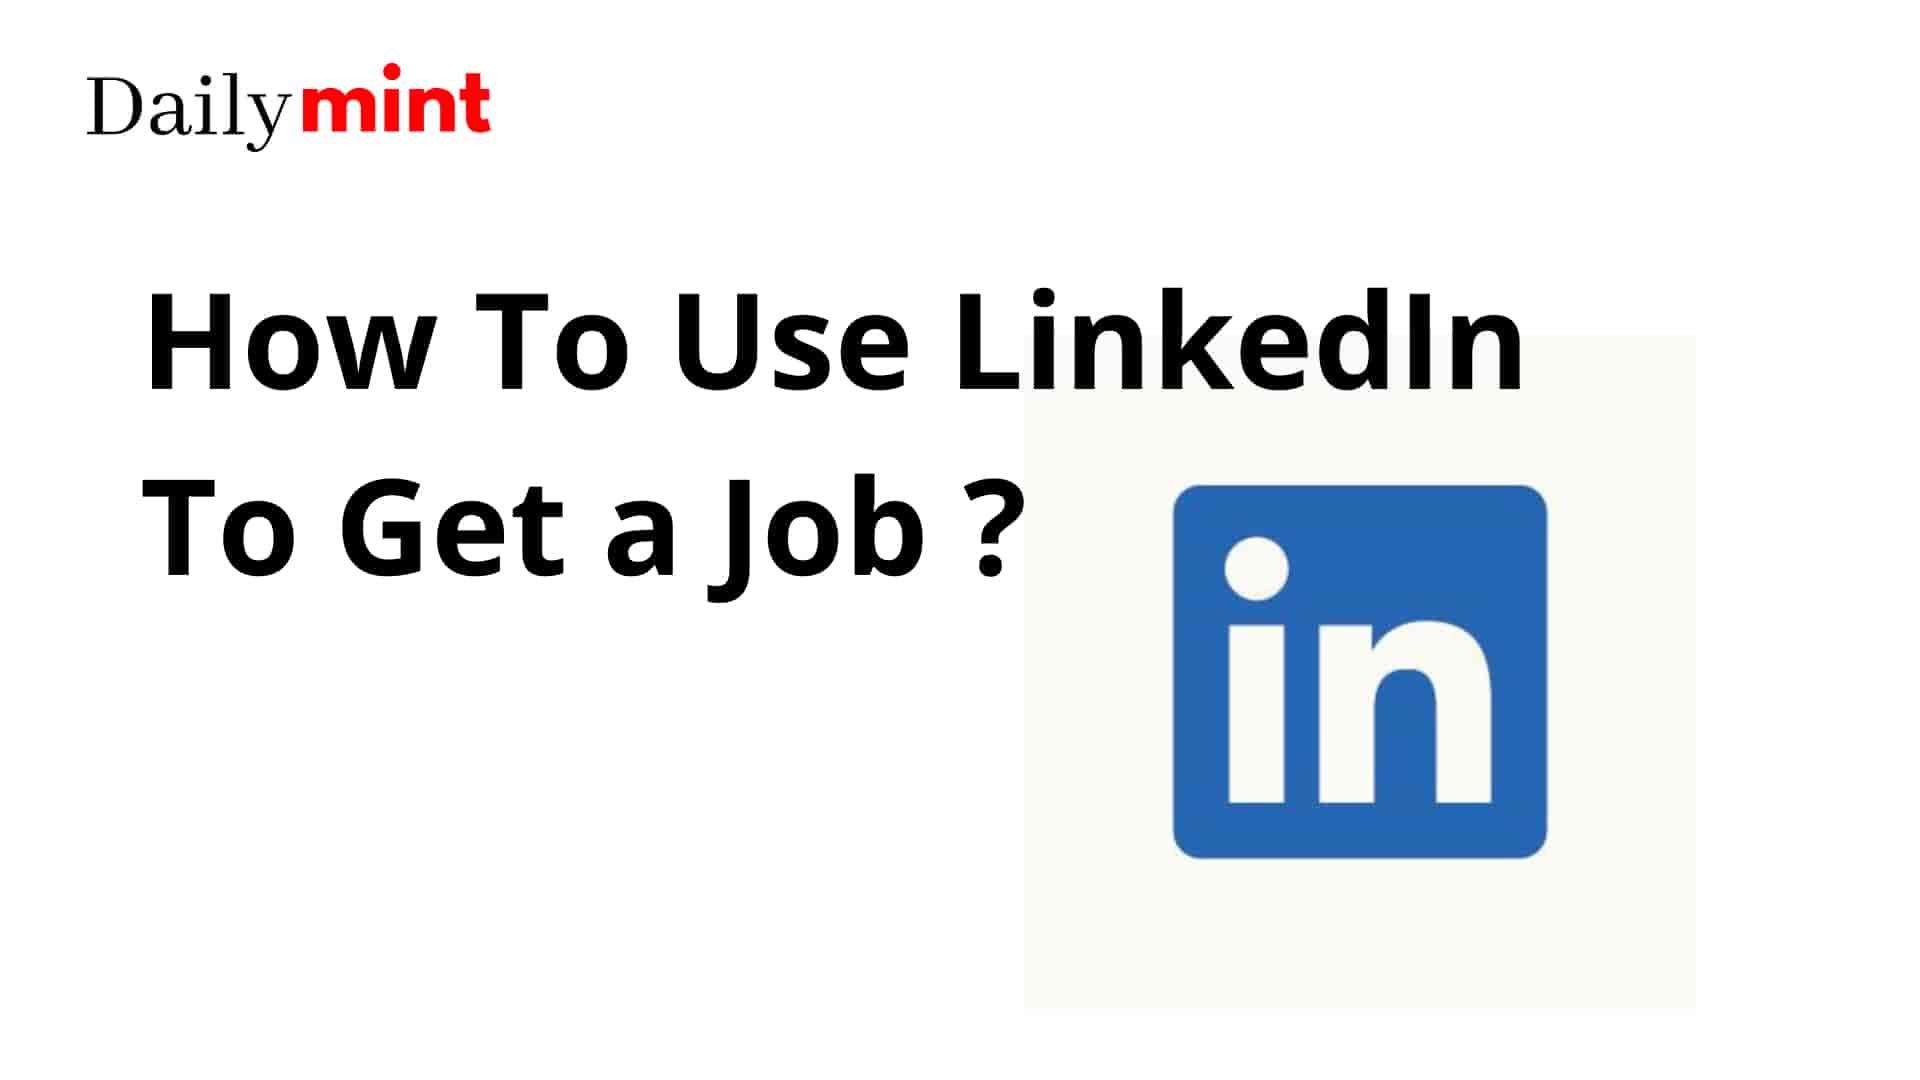 How To Use LinkedIn To Get a Job: Linkedin Job Search Tutorial